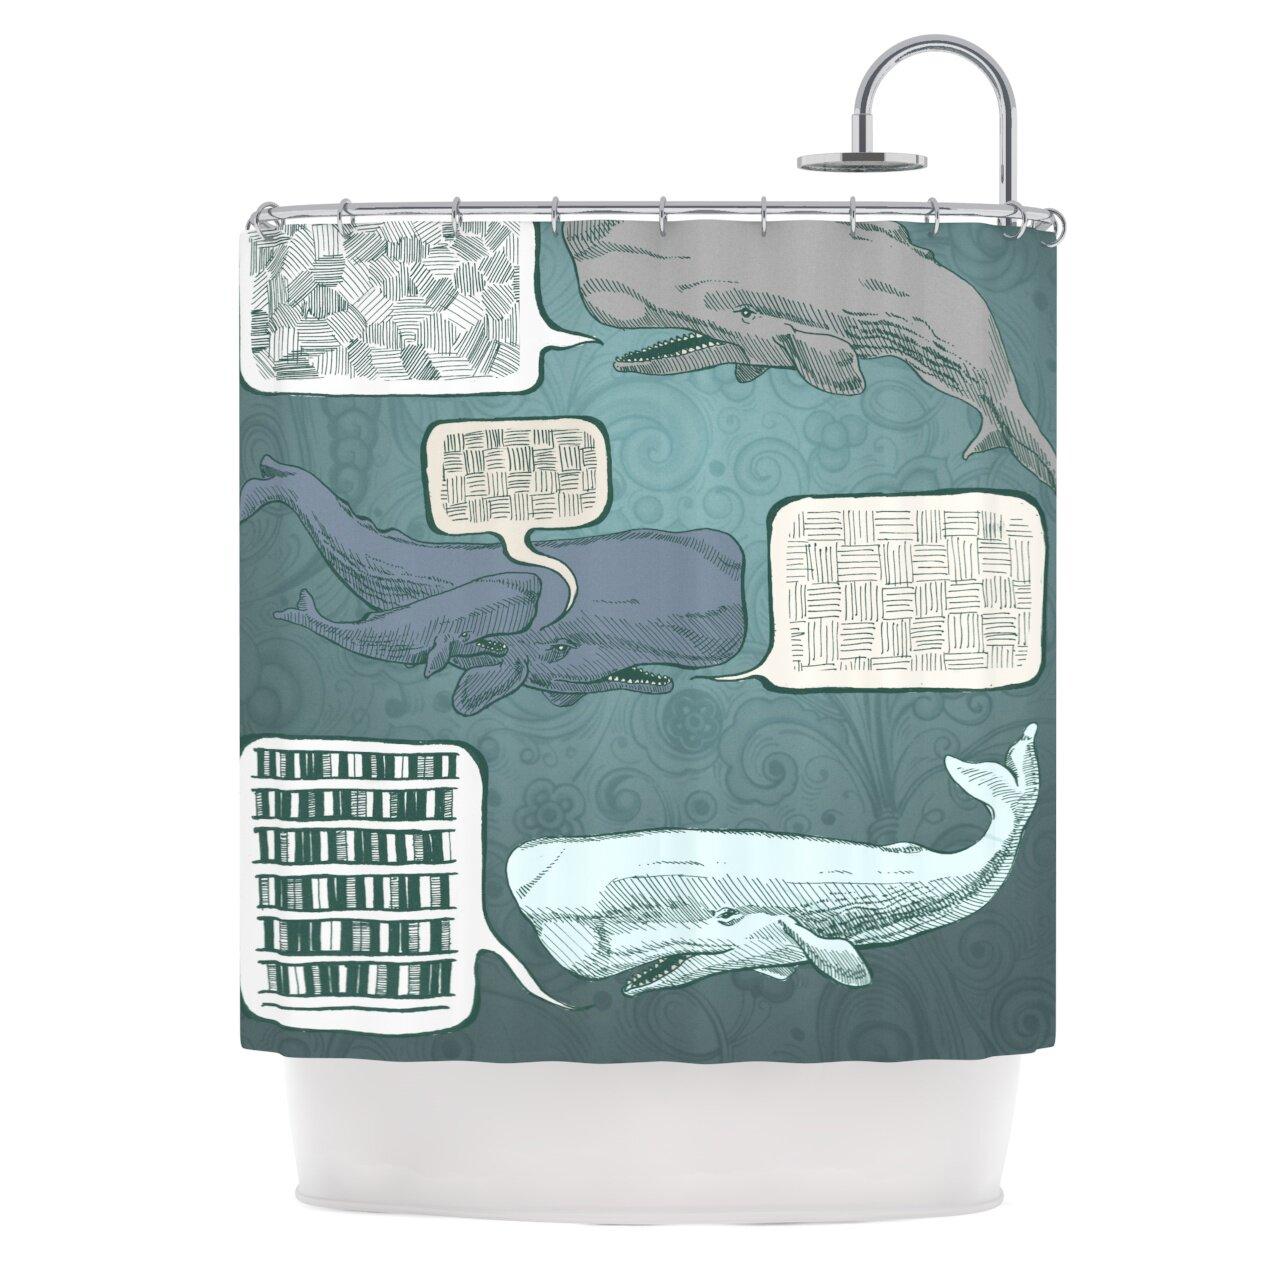 Whale shower curtain - Kess Inhouse Whale Talk Shower Curtain